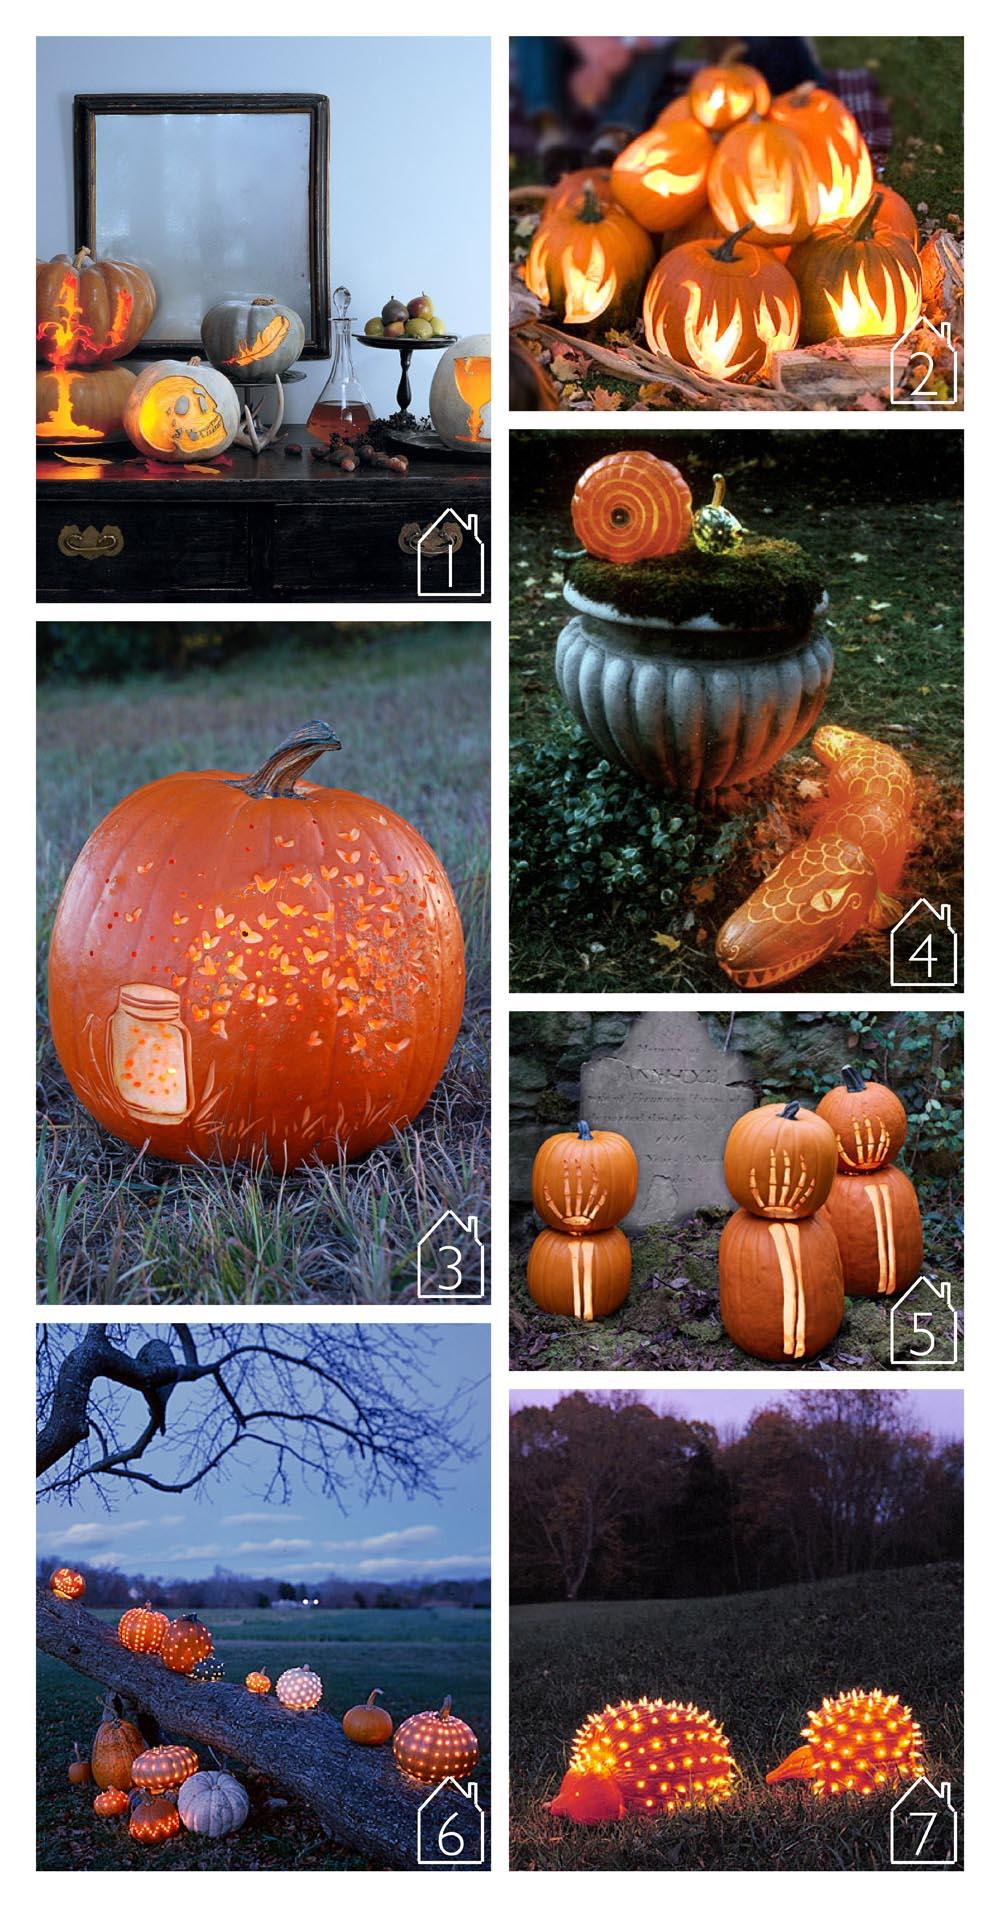 1. etched pumpkins via  Martha Stewart  2. flame pumpkins via  Better Homes and Gardens  3. mason jar pumpkin via  HGTV Gardens  4. alligator pumpkin via  Martha Stewart  5. skeleton pumpkin via  Country Living  6. celestial pumpkins via  Martha Stewart  7. porcupine pumpkins via  Martha Stewart